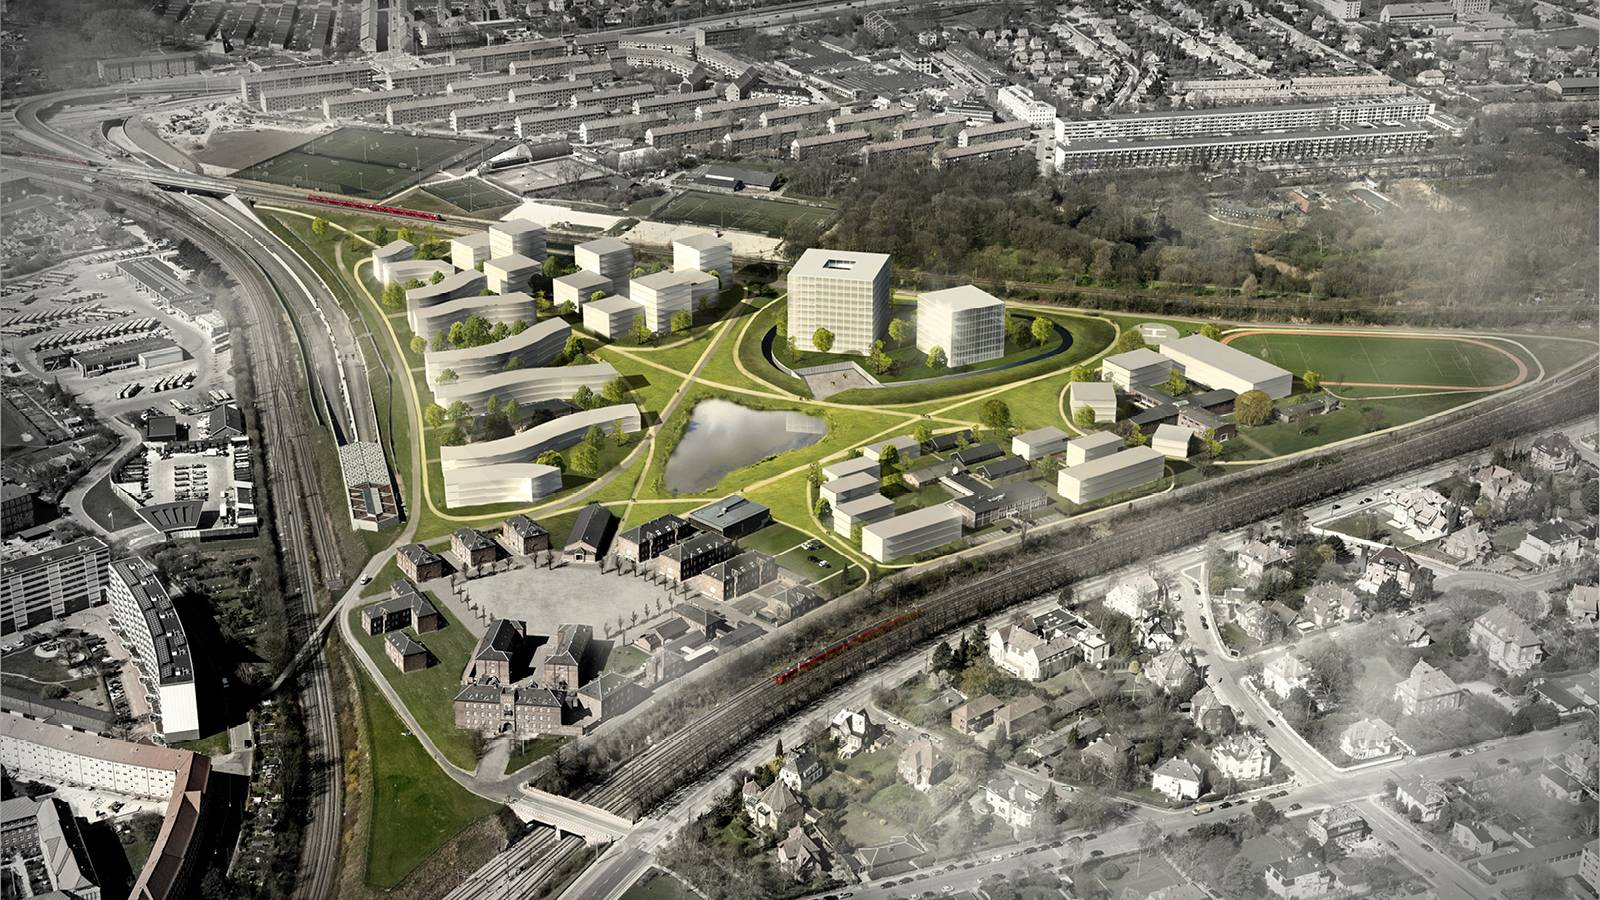 AERIAL VIEW - Svanemøllens Kaserne - SPOL Architects